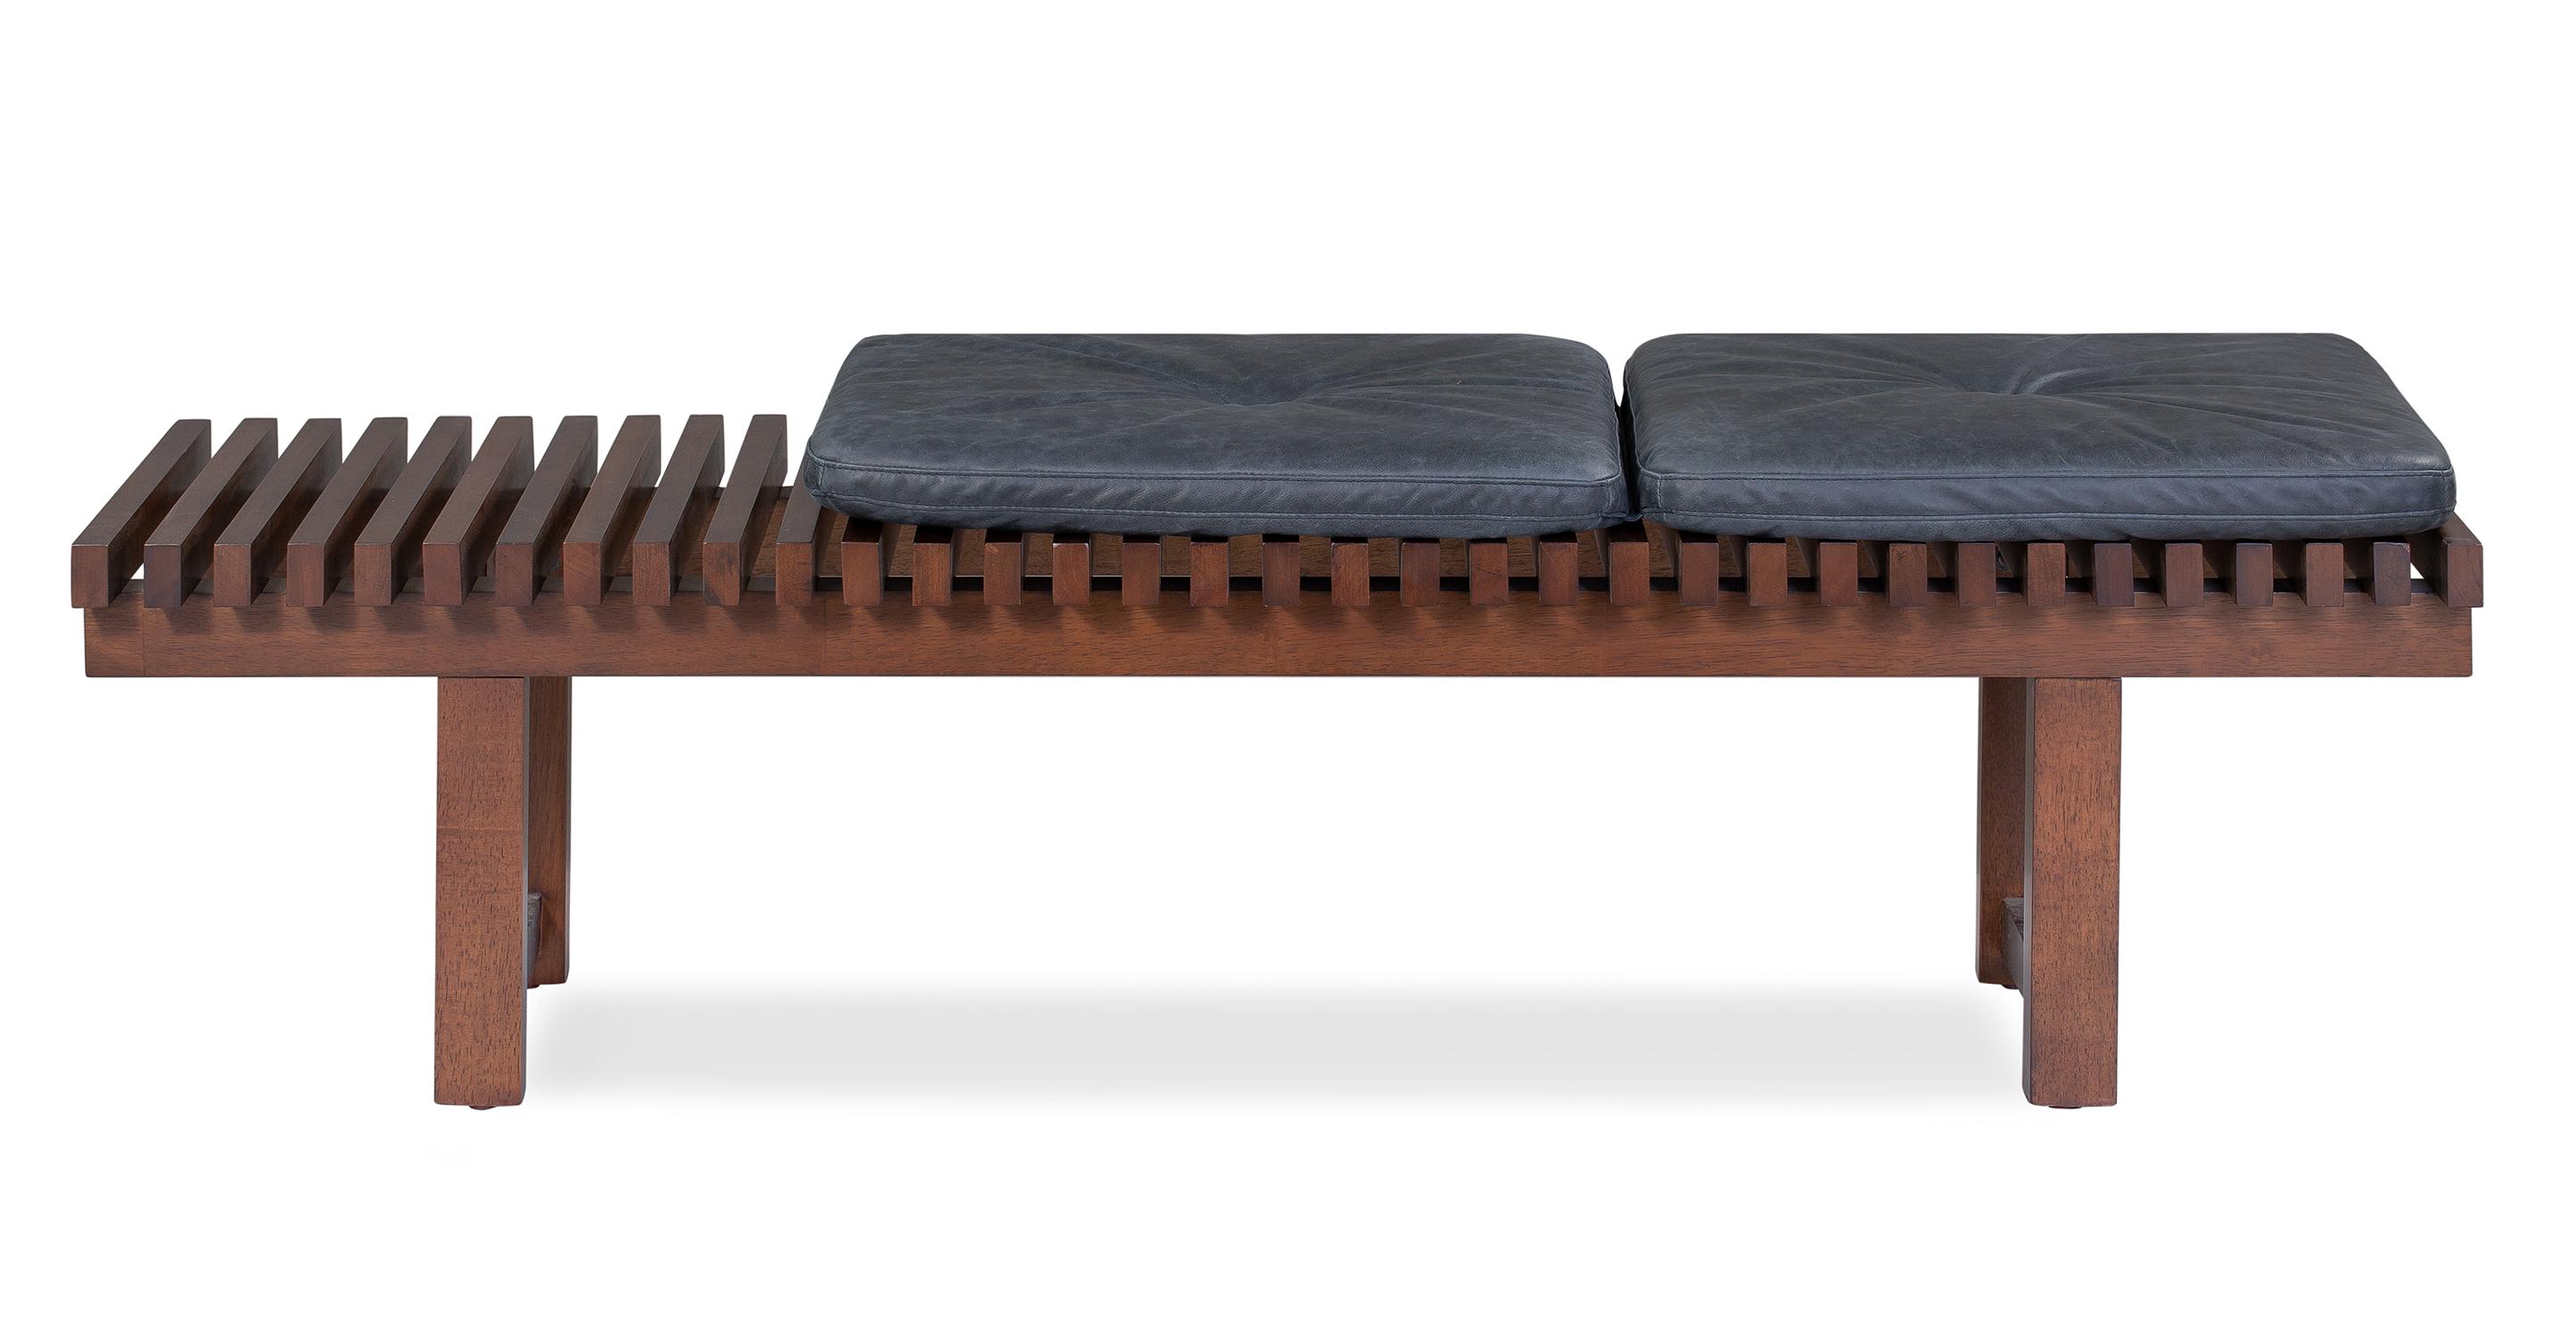 "Slat 42"" Leather Bench, Black Top Grain Full Aniline Leather"